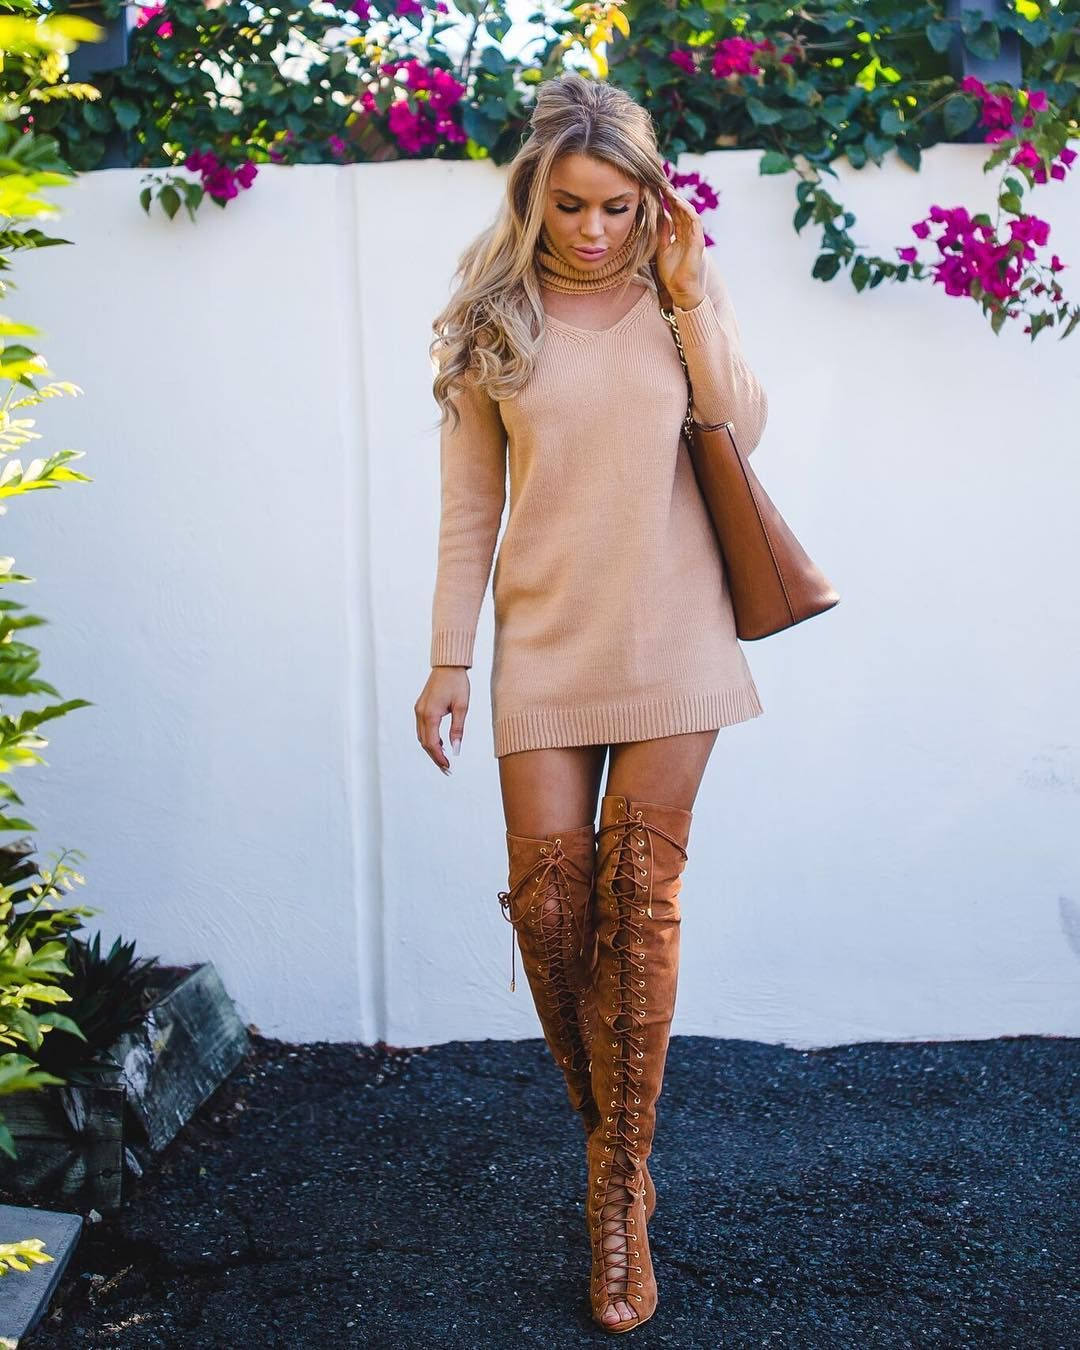 Skye wheatley skye pinterest clothing and fashion for Emily addison nyc